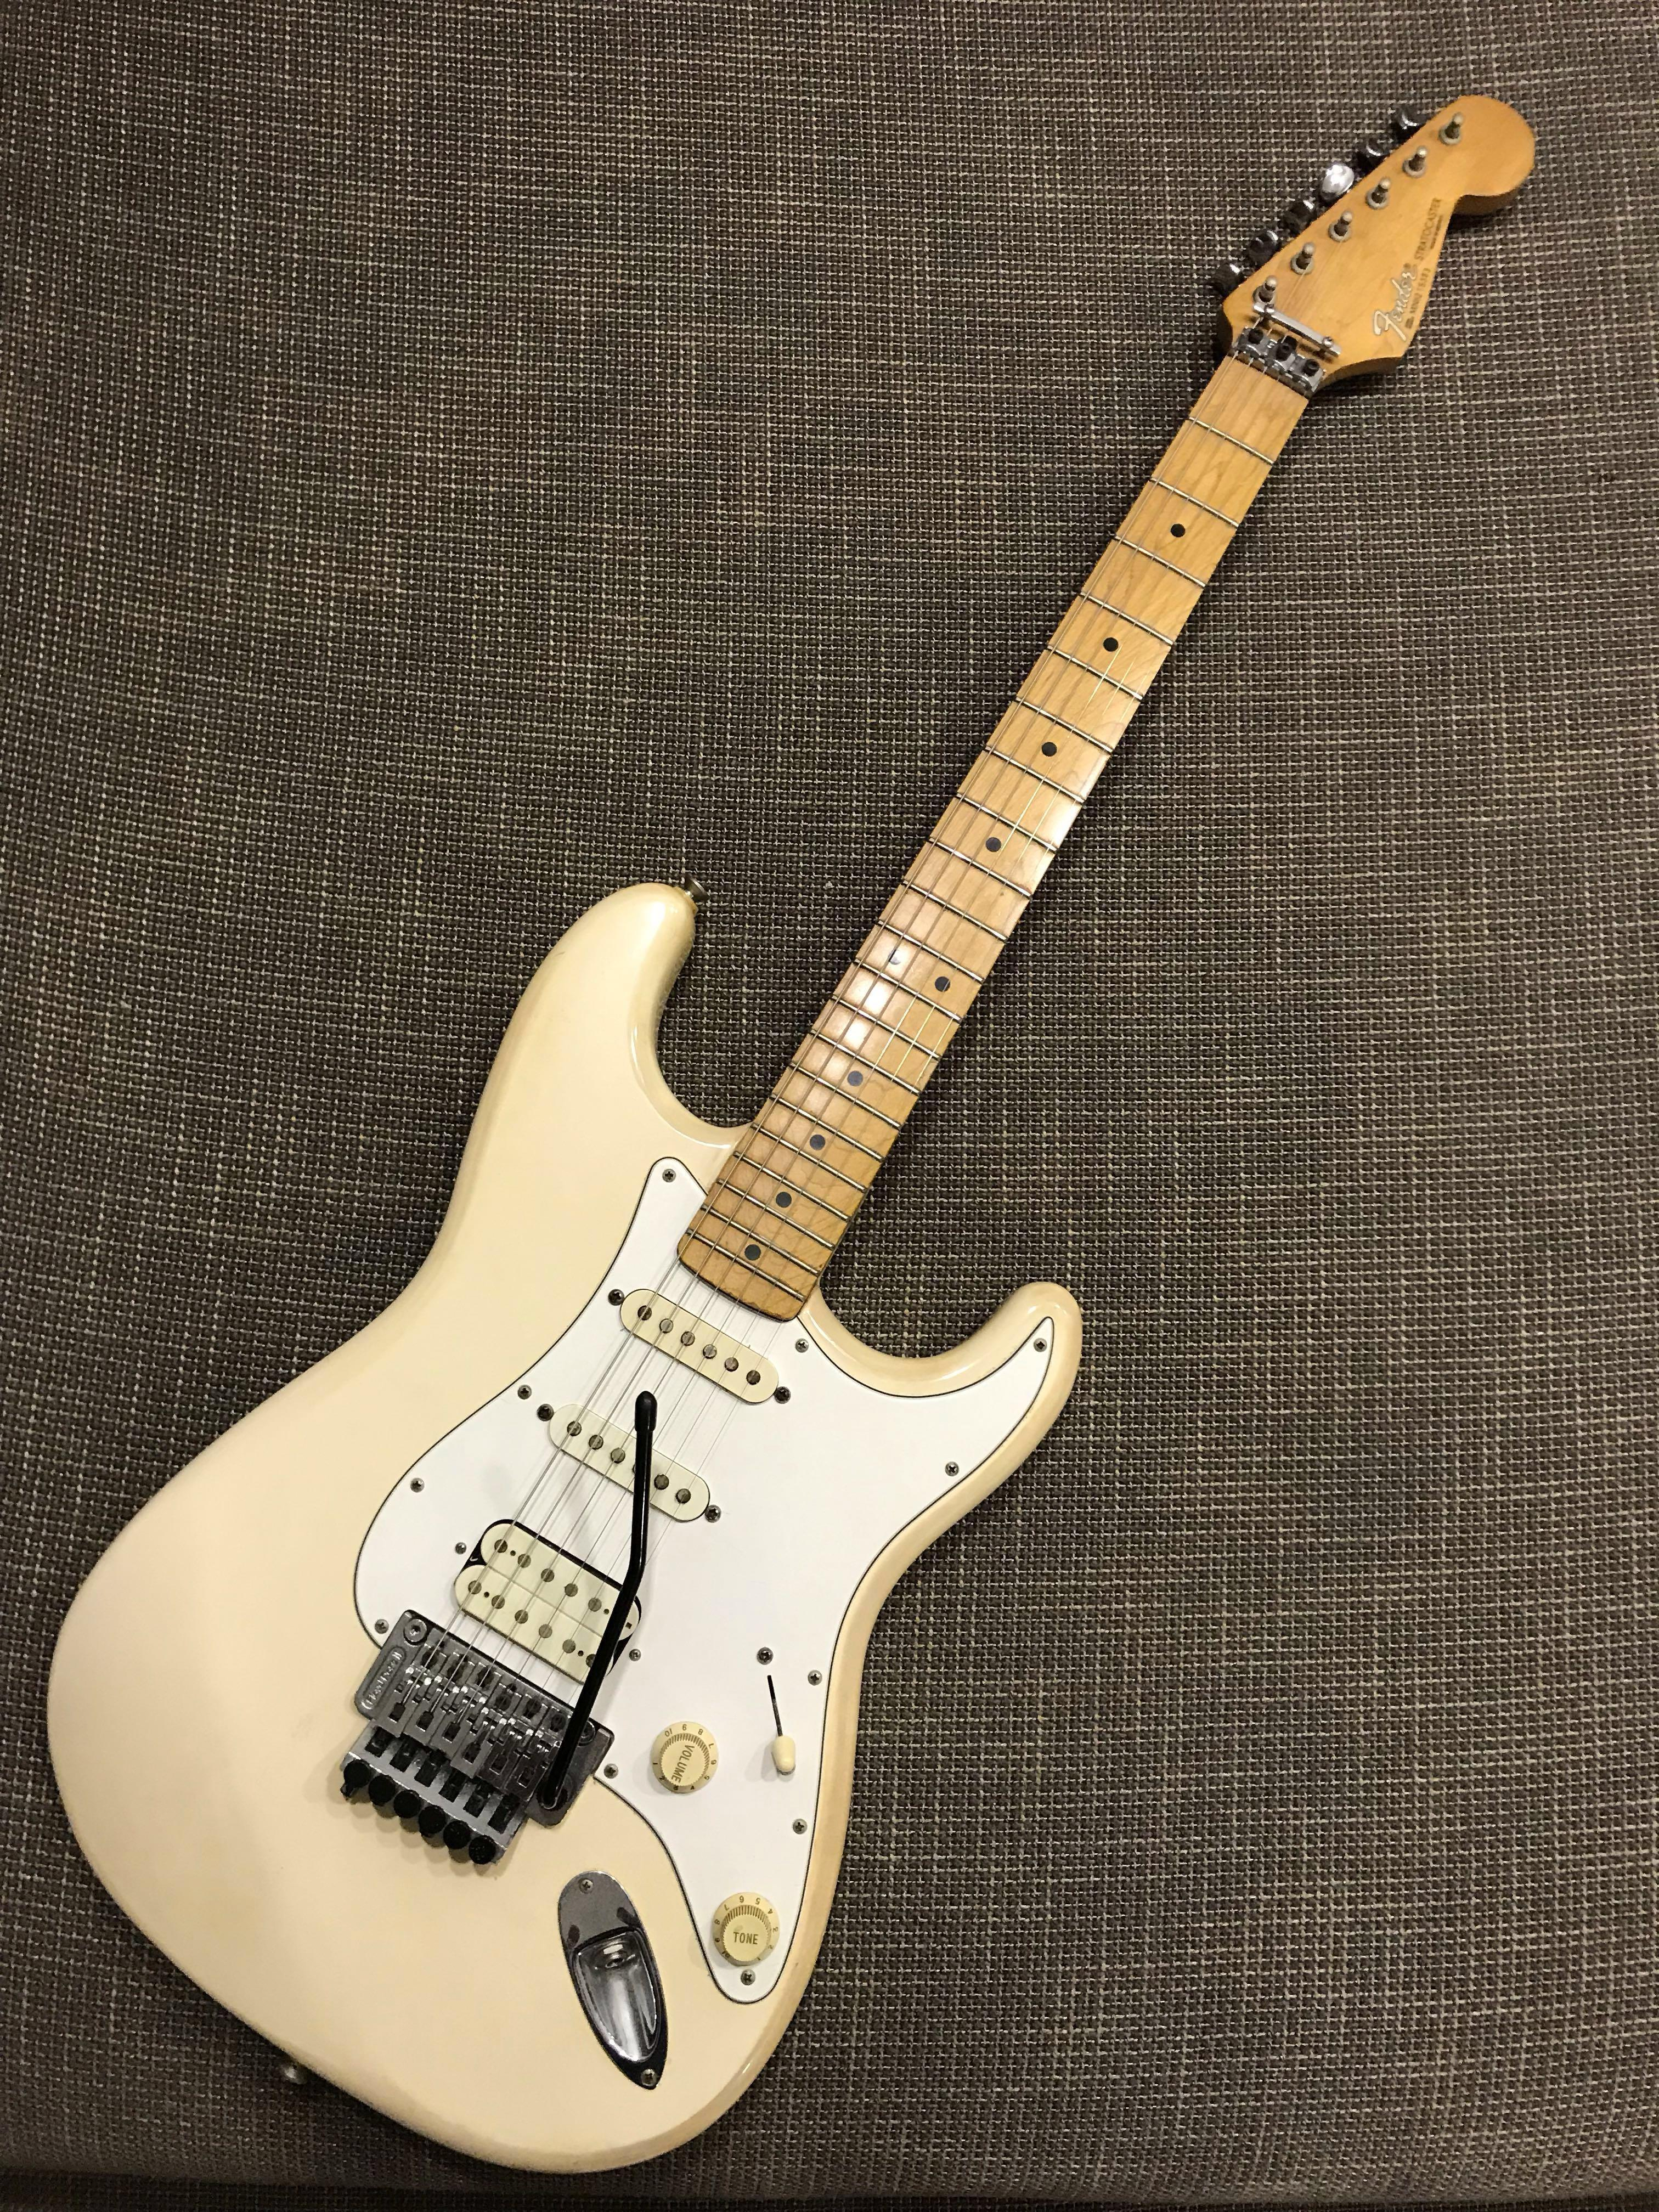 1996 Fender Standard Stratocaster MIM (FLOYD ROSE), Music